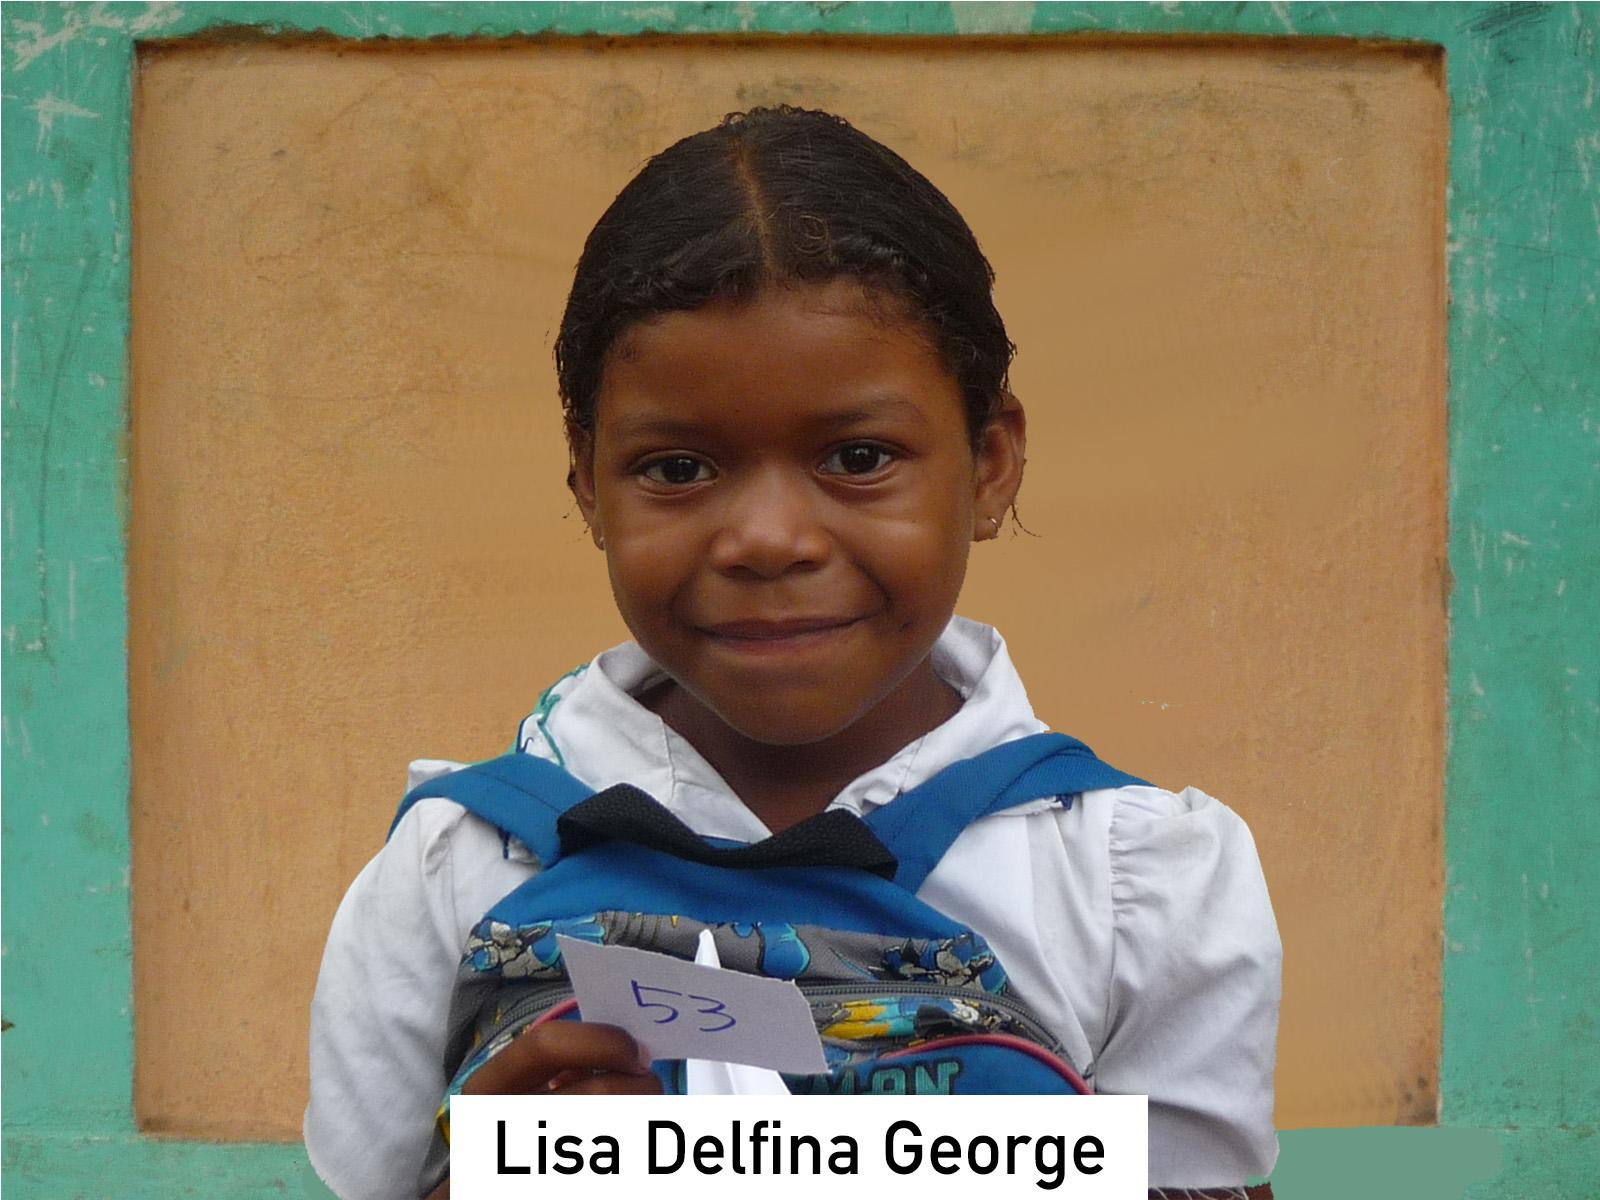 053 - Lisa Delfina George.jpg